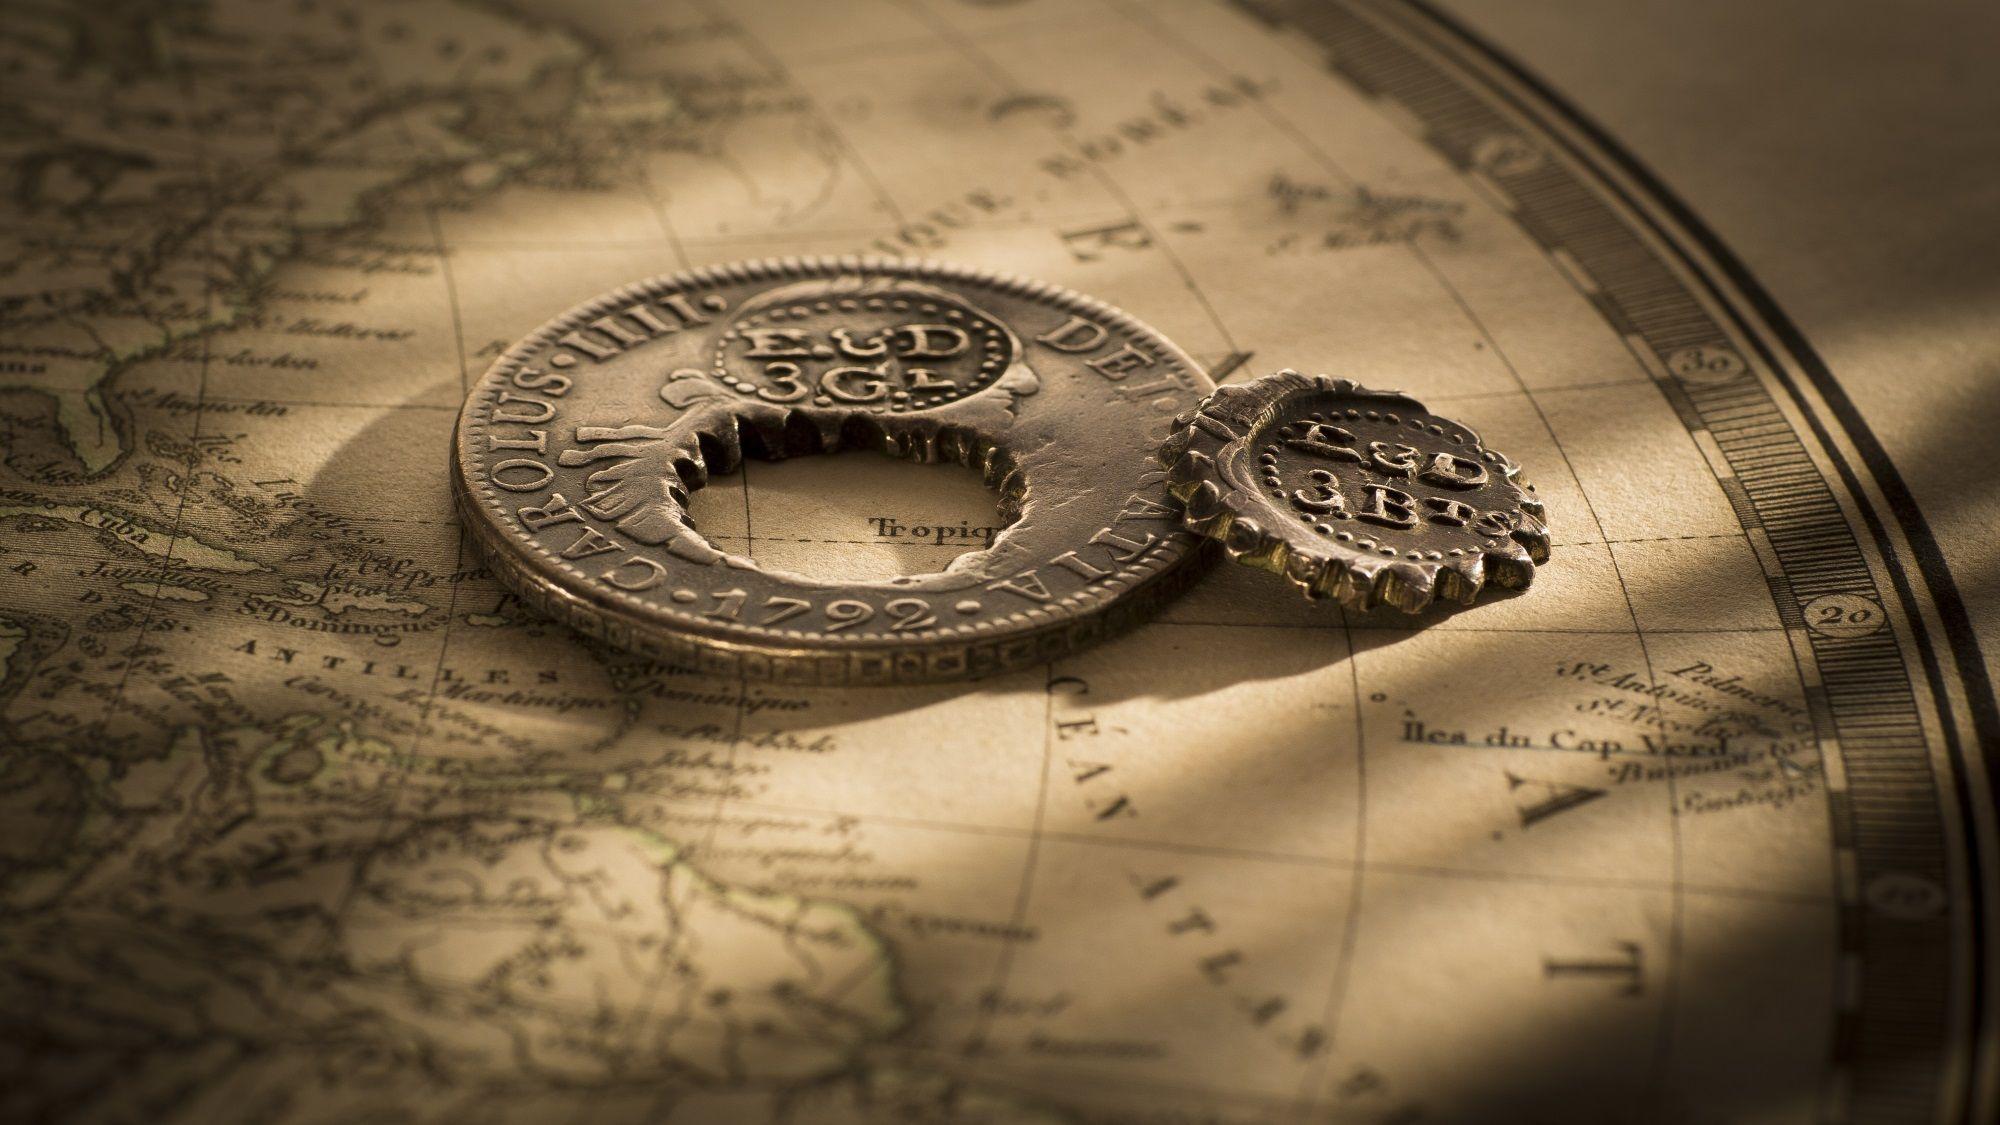 British Guiana Holey Dollar and Dump Rev